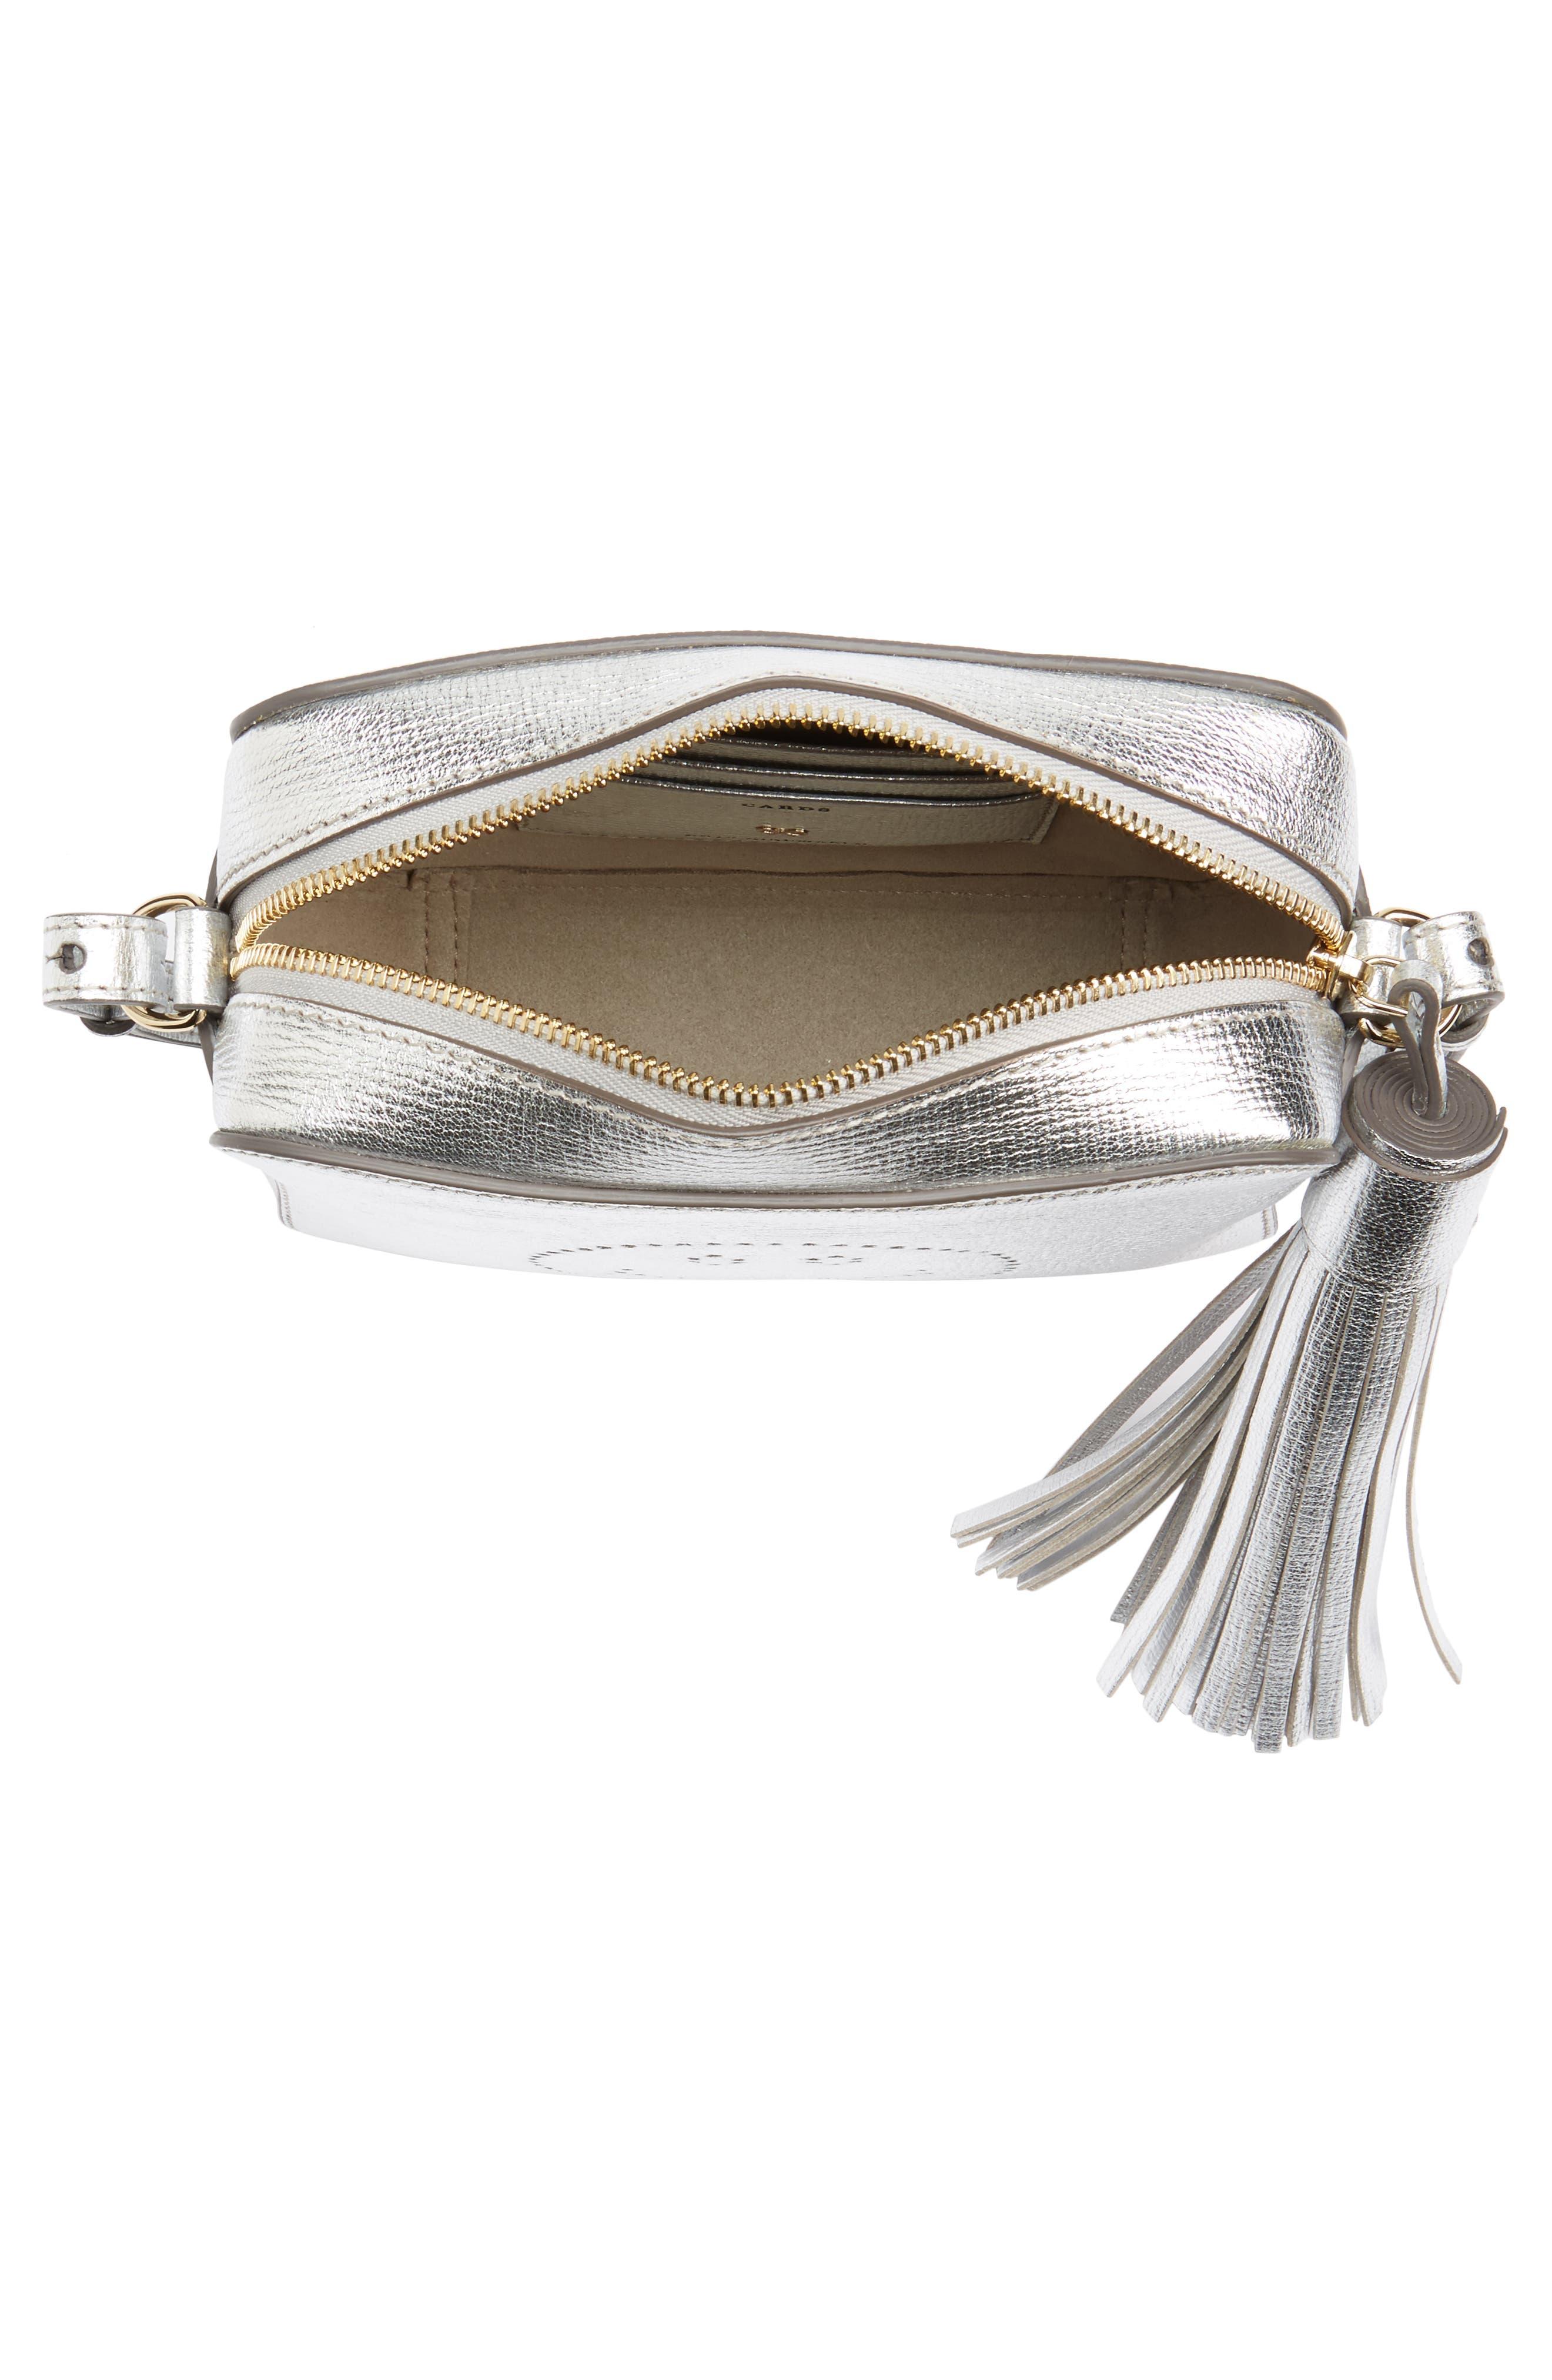 Smiley Metallic Leather Crossbody Bag,                             Alternate thumbnail 4, color,                             040